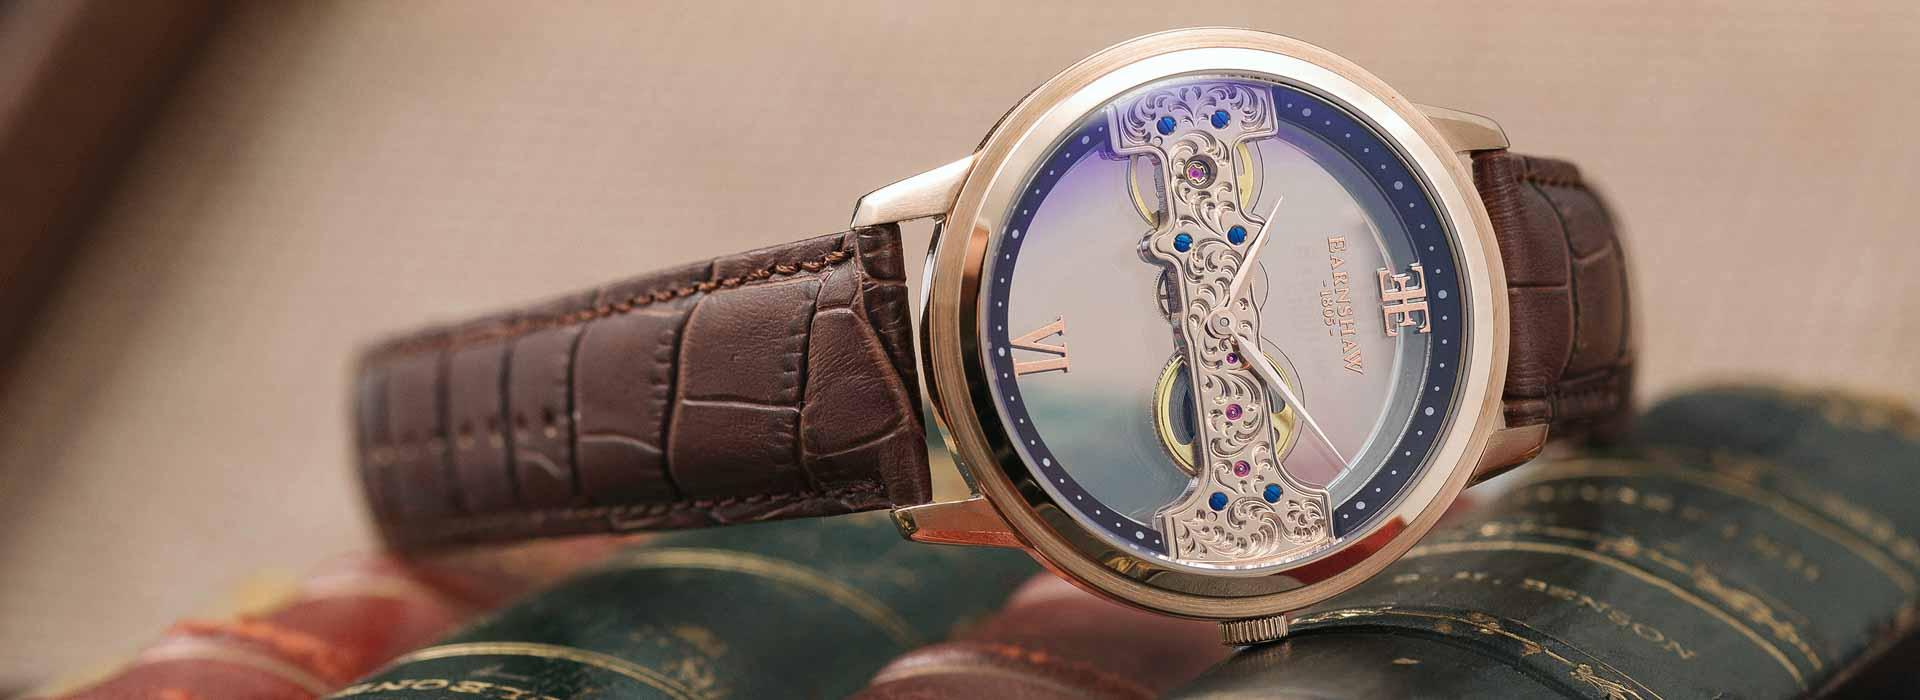 thomas earnshaw watches